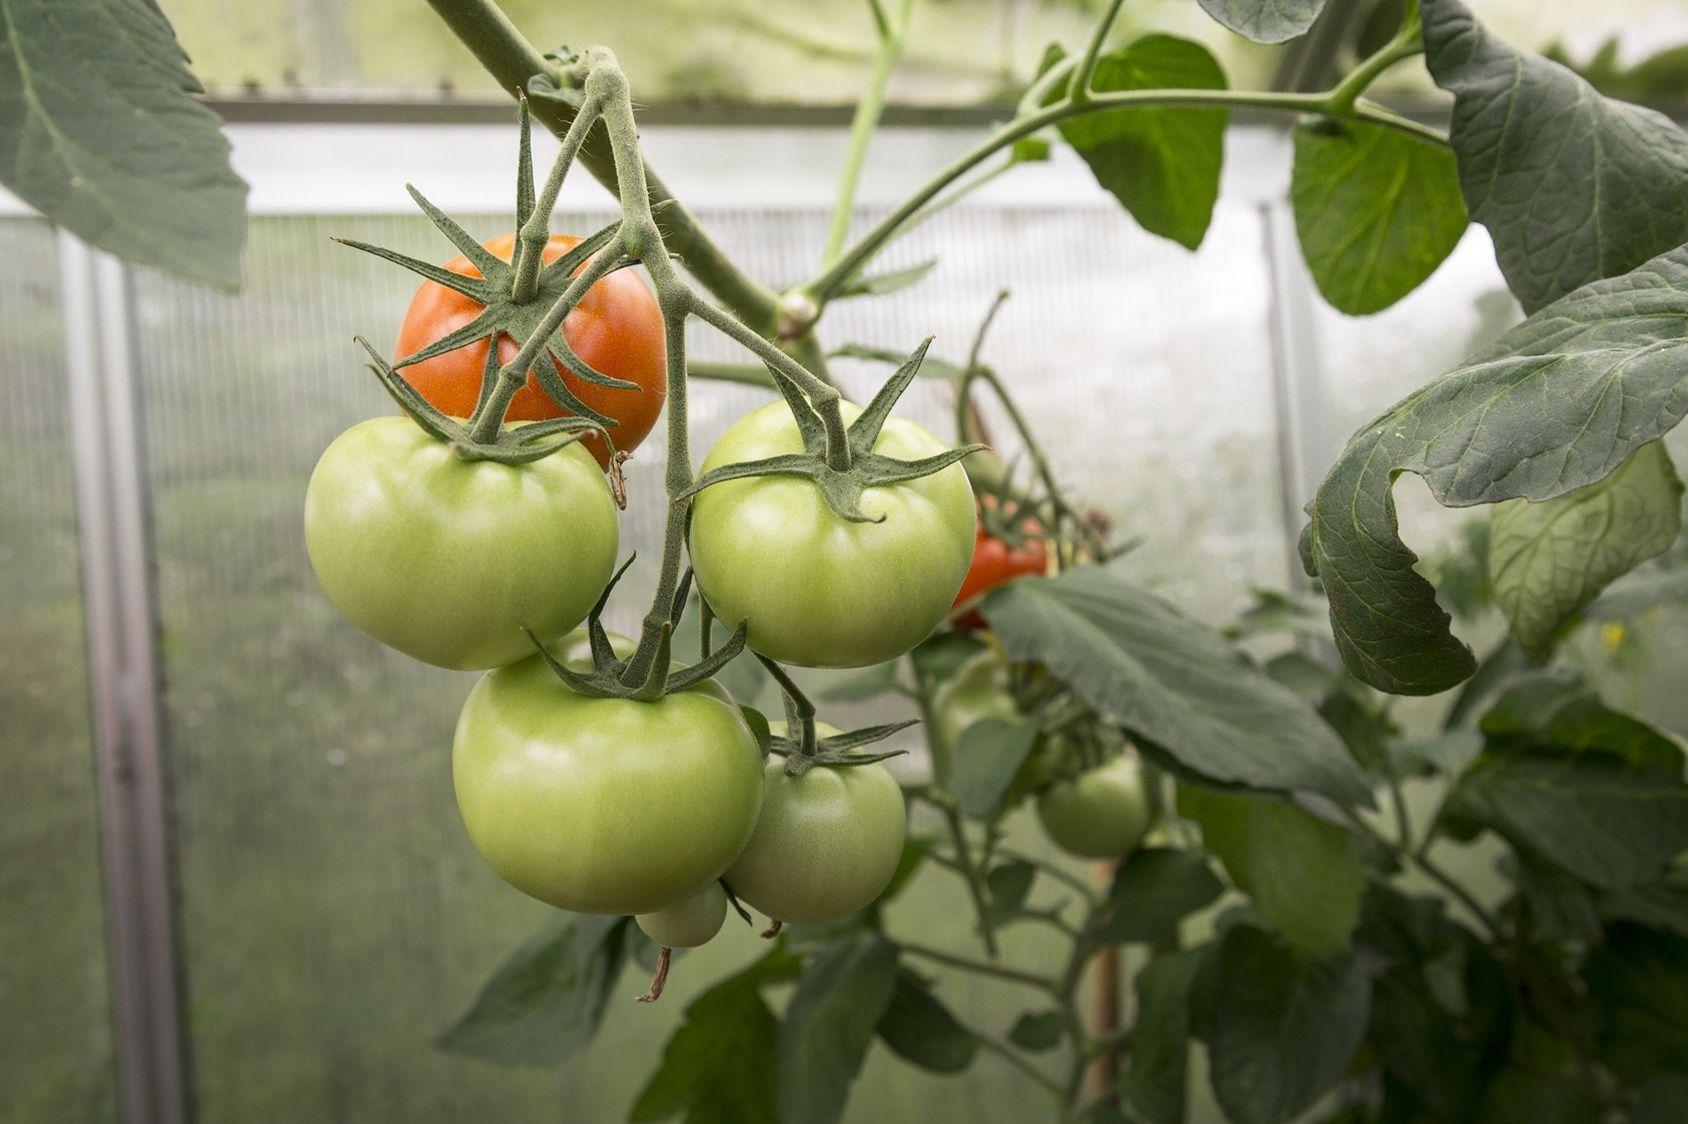 Quels Legumes Cultiver Dans Une Serre En Hiver Cultiver